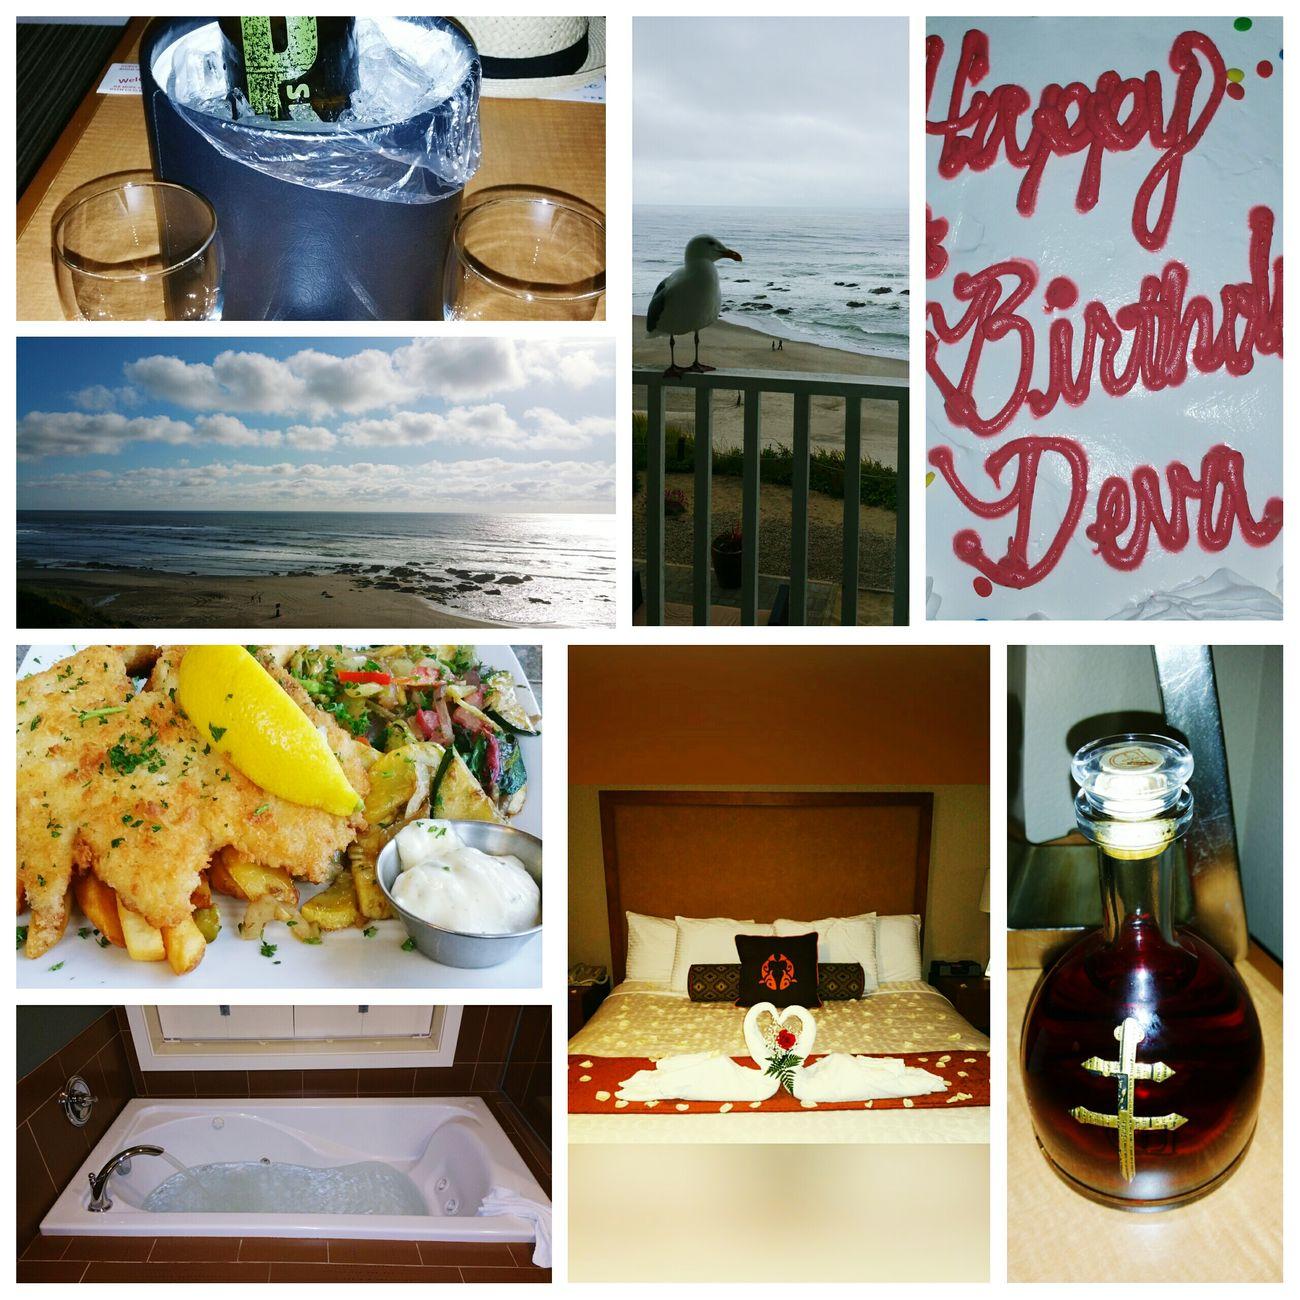 Birthday Behavior